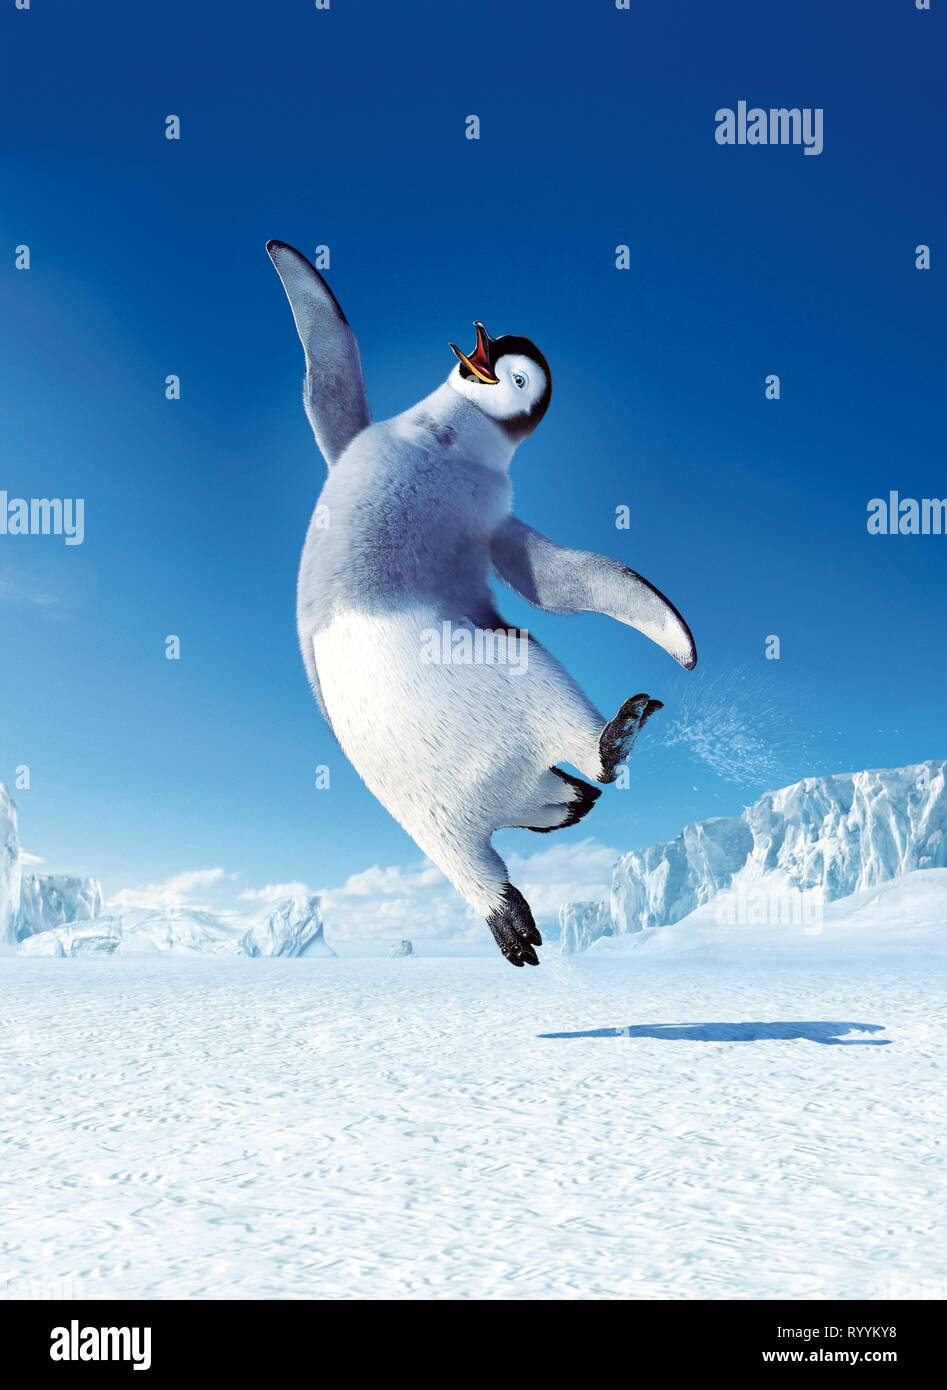 Mumble The Penguin Happy Feet 2006 Stock Photo Alamy